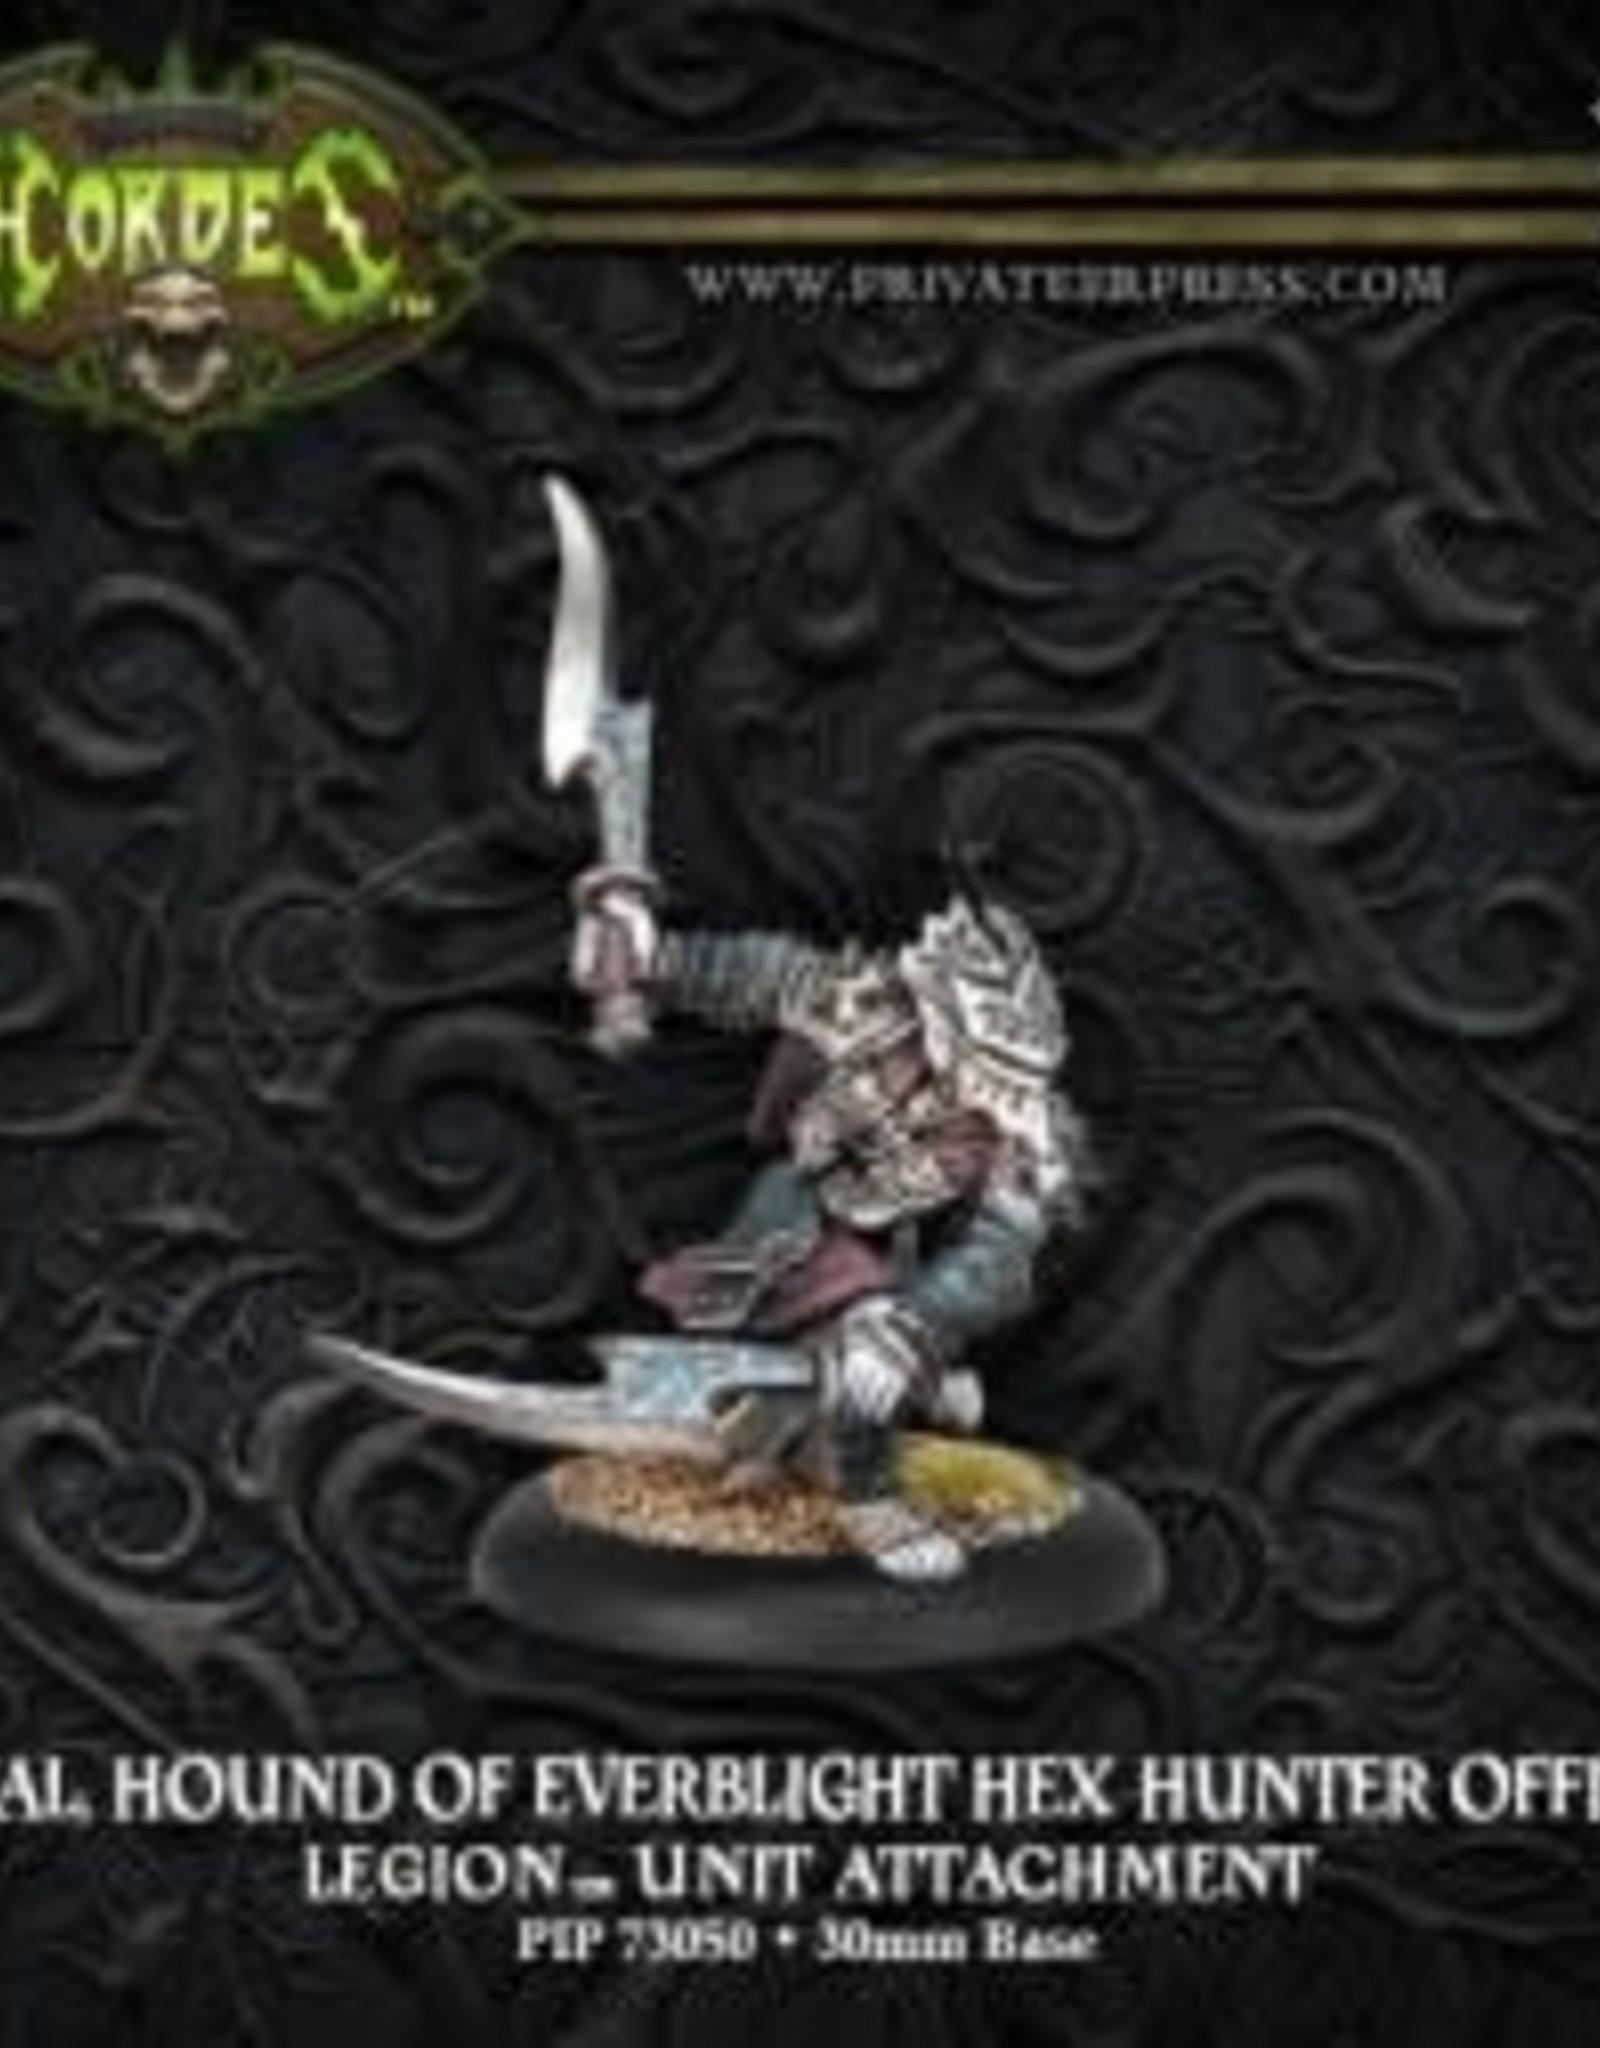 Hordes Everblight - Bayal Hound of Everblight Hex Hunter Officer